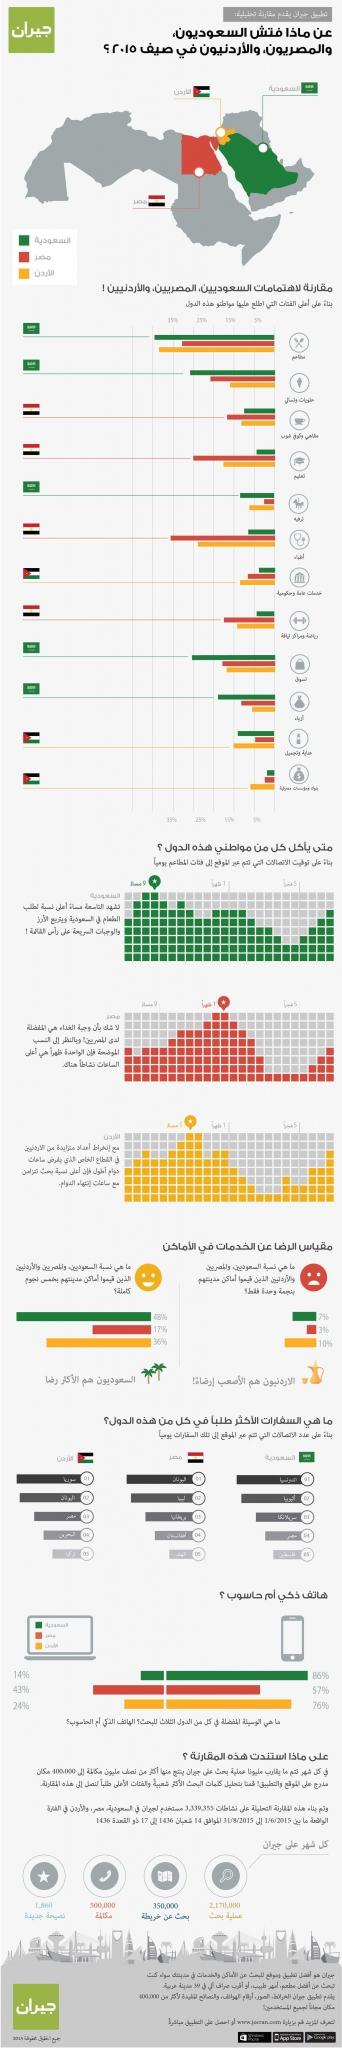 Jeeran-Infographic-For-Release